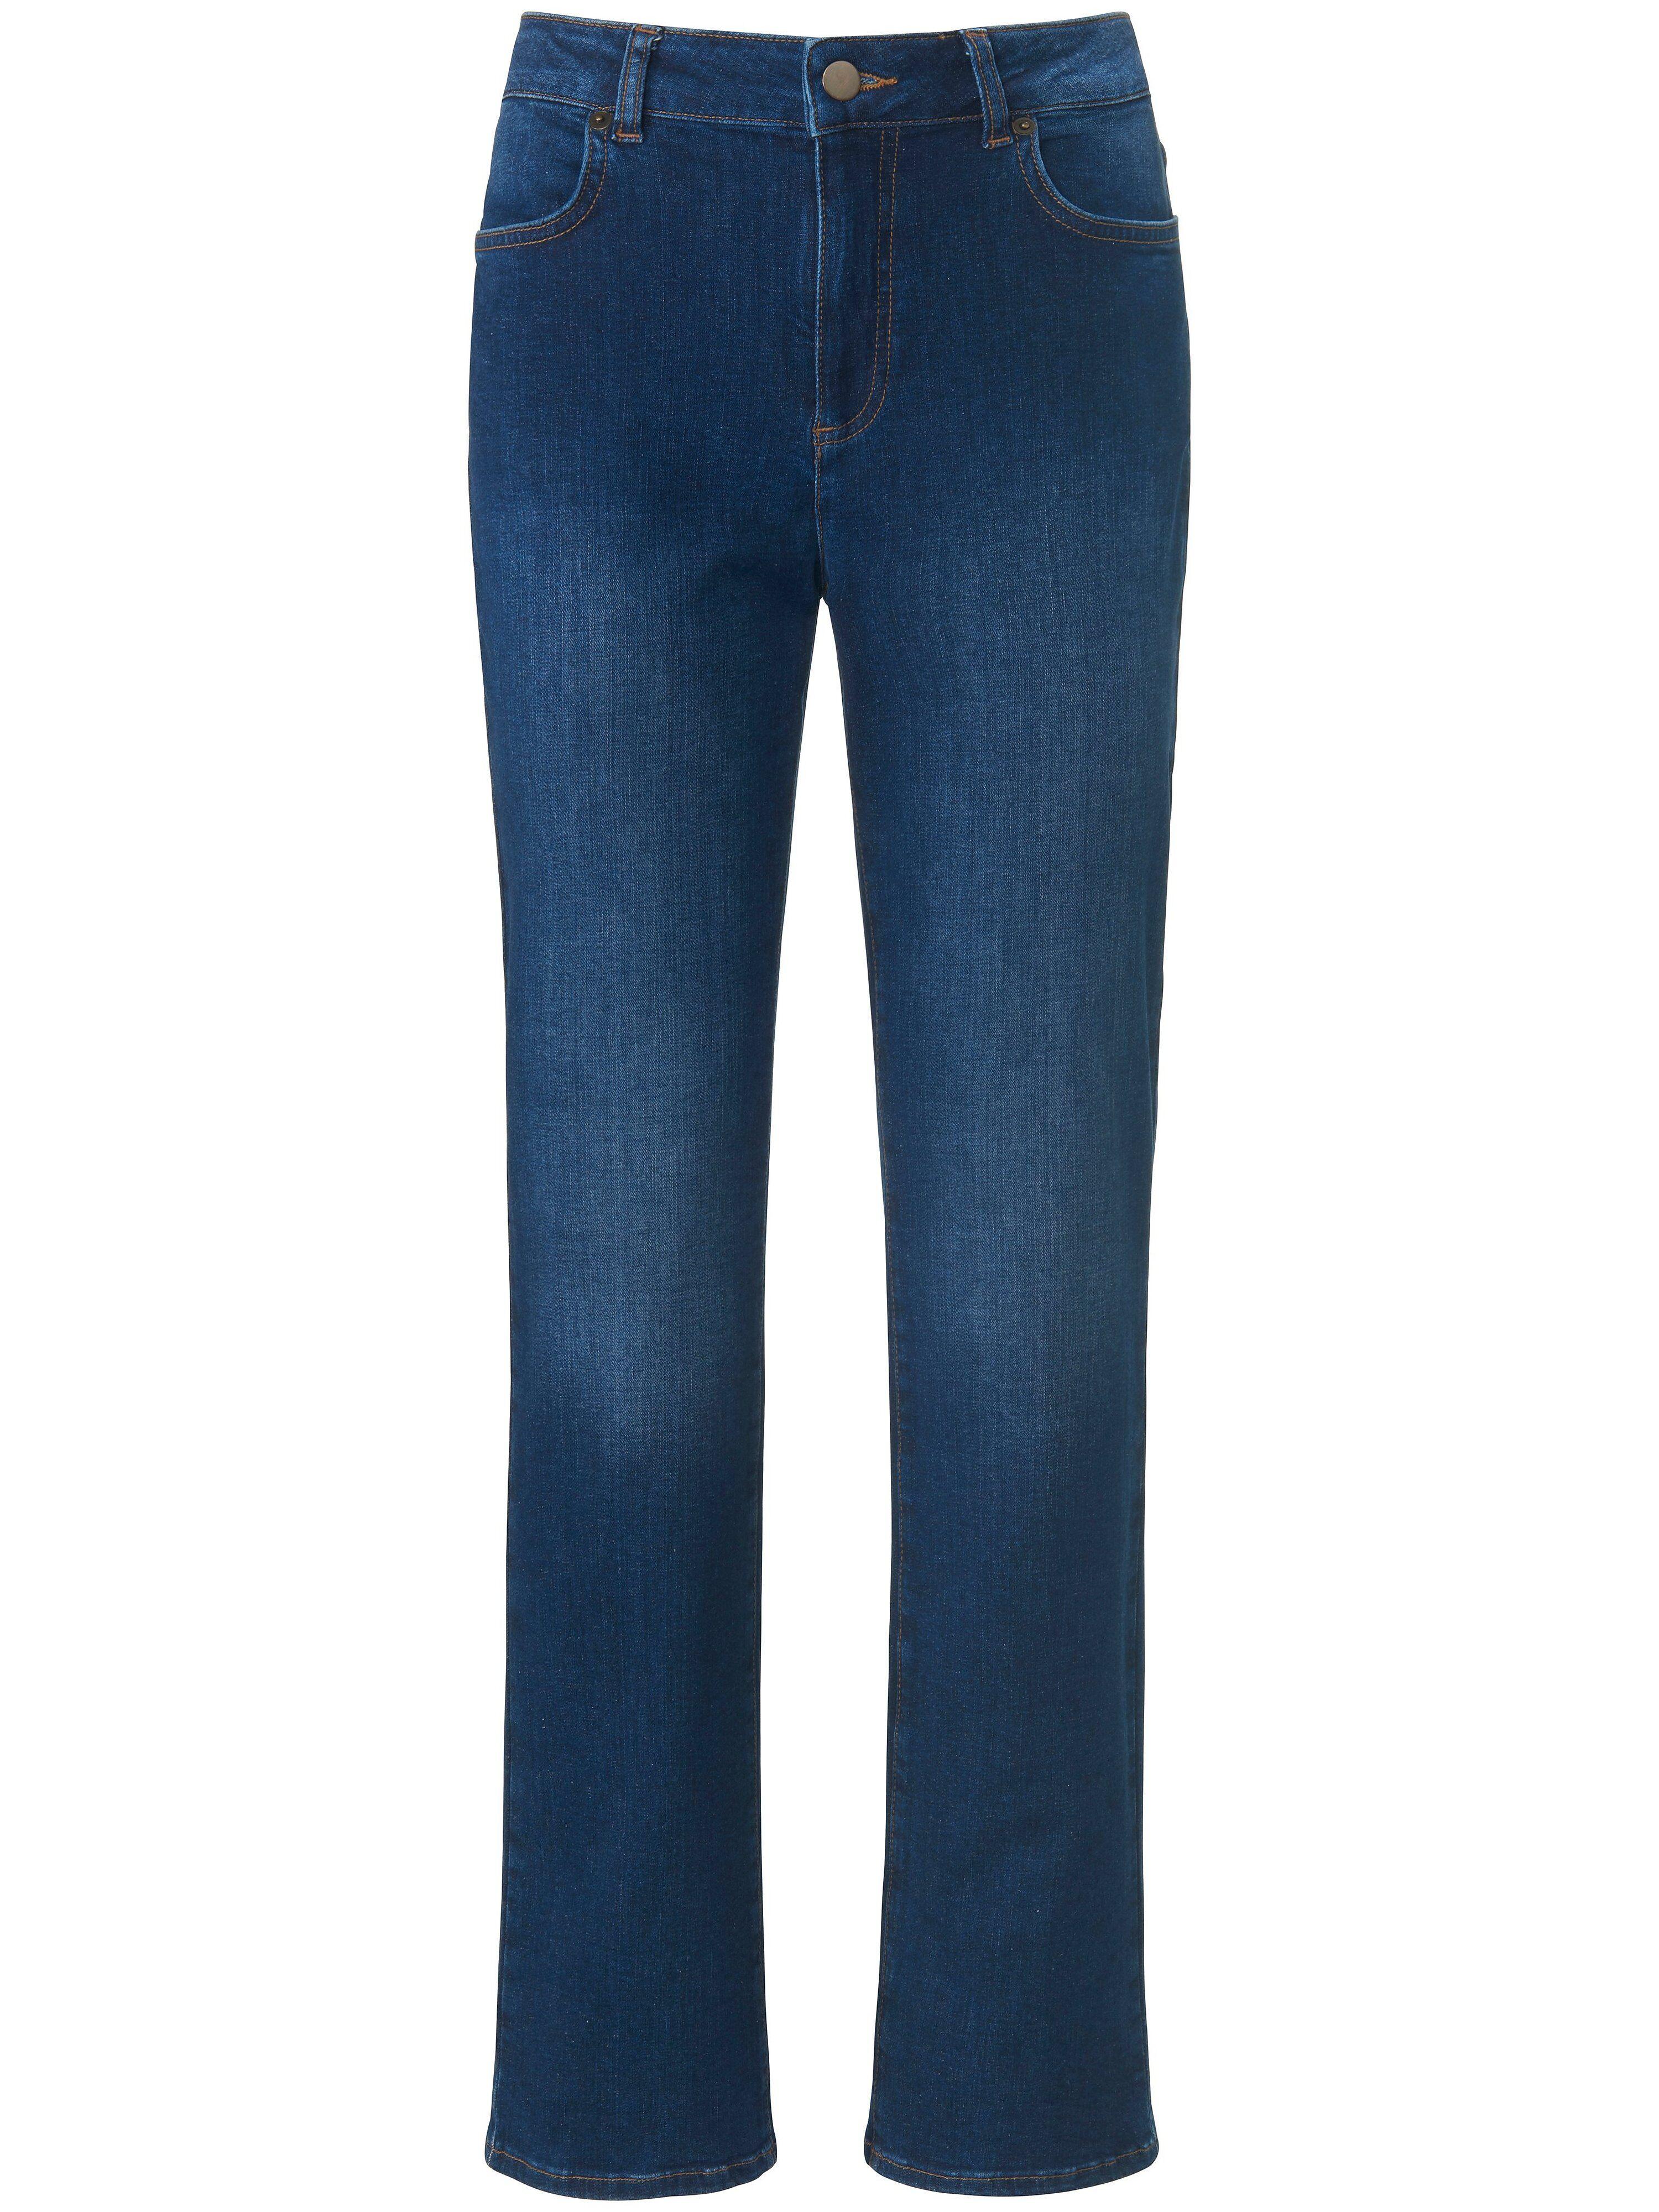 Uta Raasch Le jean ligne droite  Uta Raasch denim  - Femme - 38